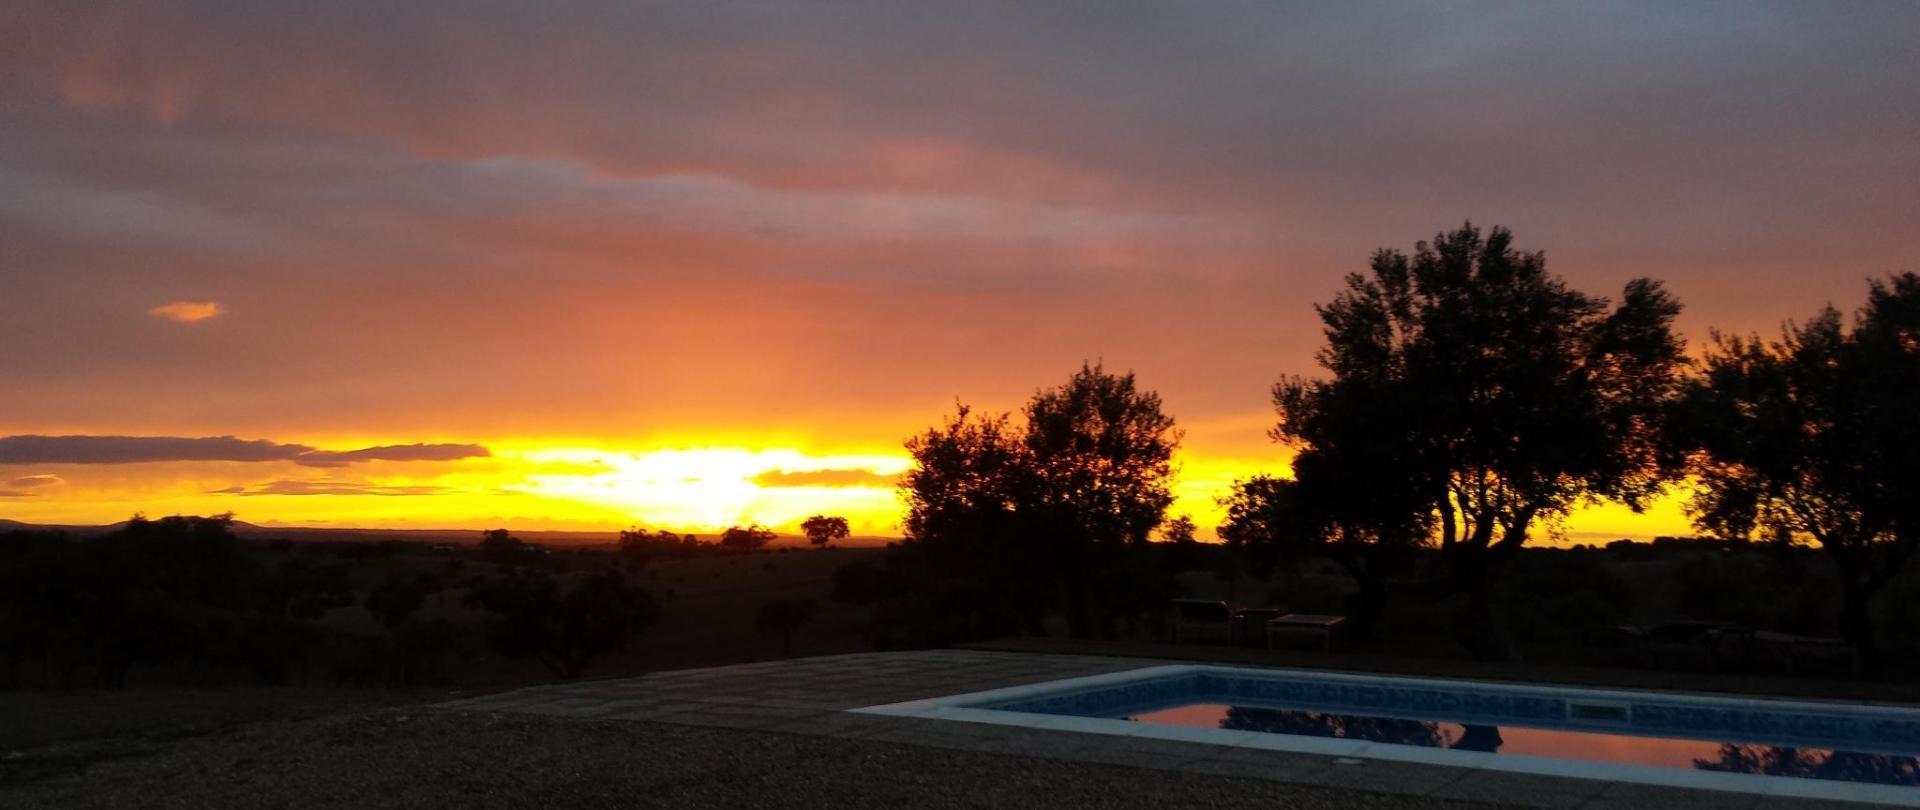 Sonnenuntergang Pool.jpg